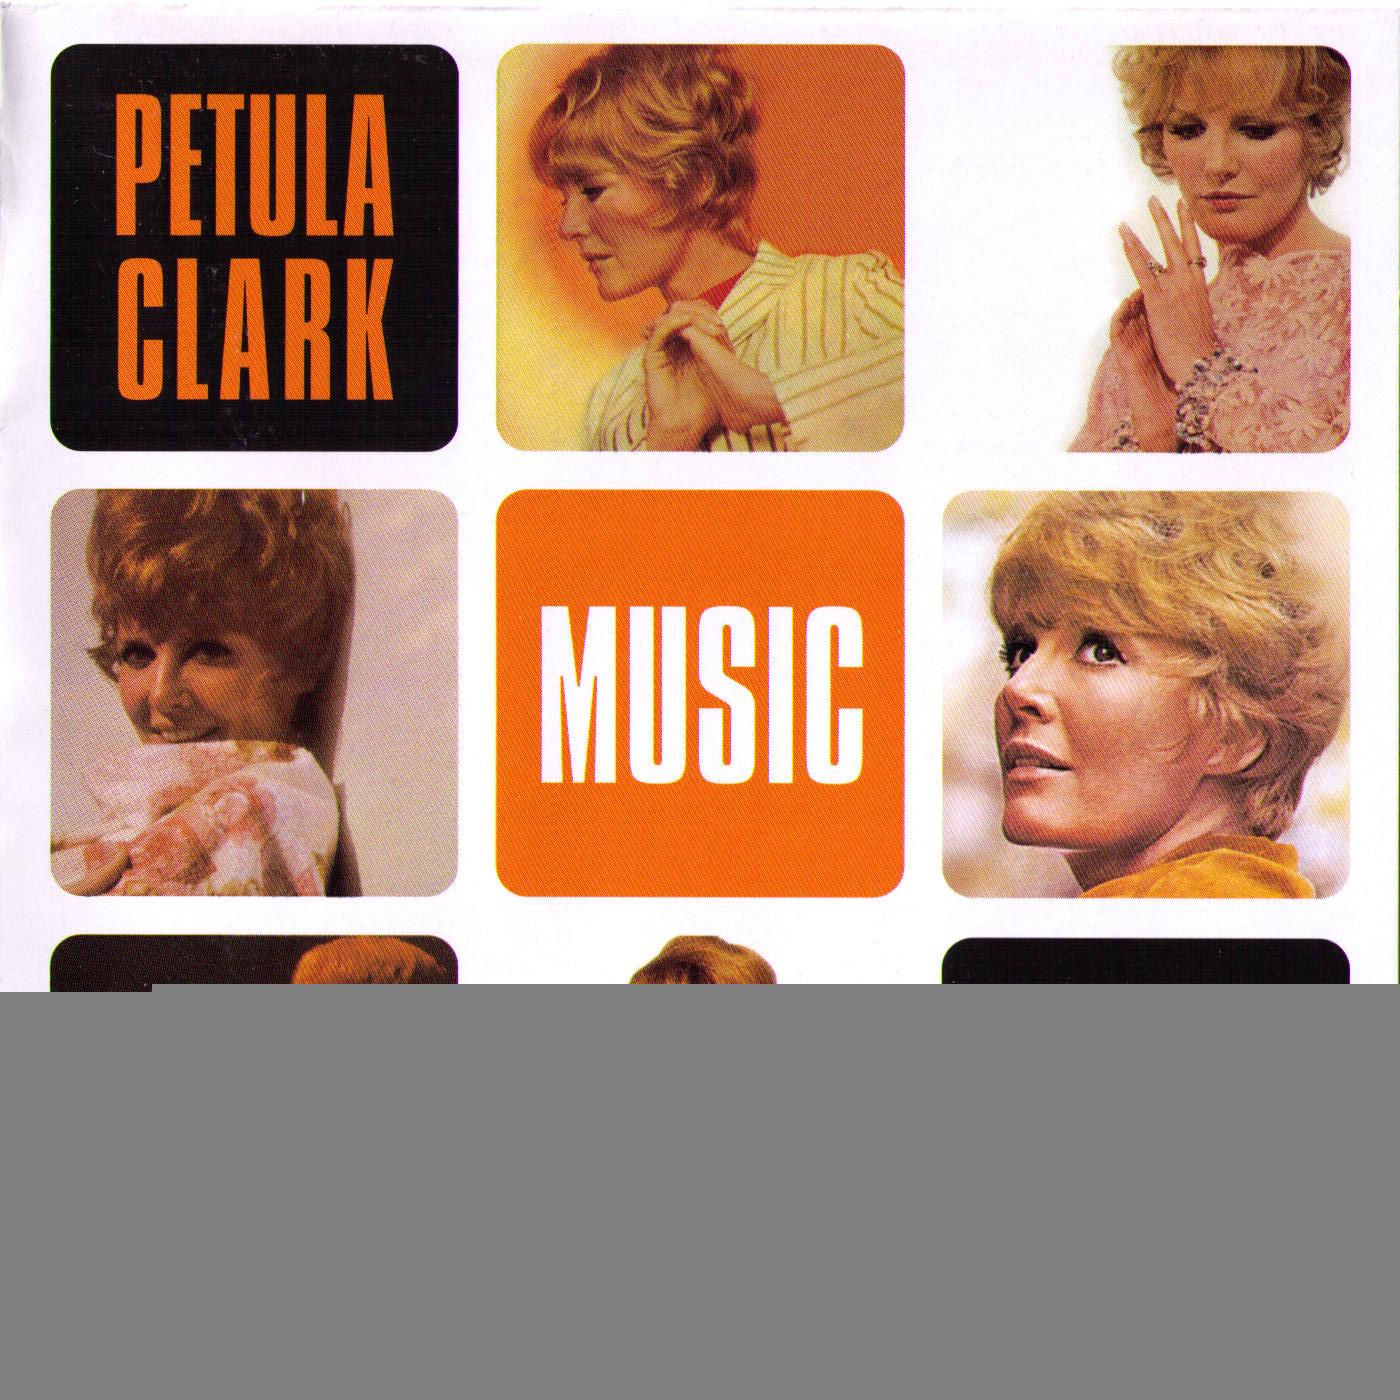 Petula Clark Love Me With All Your Heart (Cuando Calienta El Sol) cover art